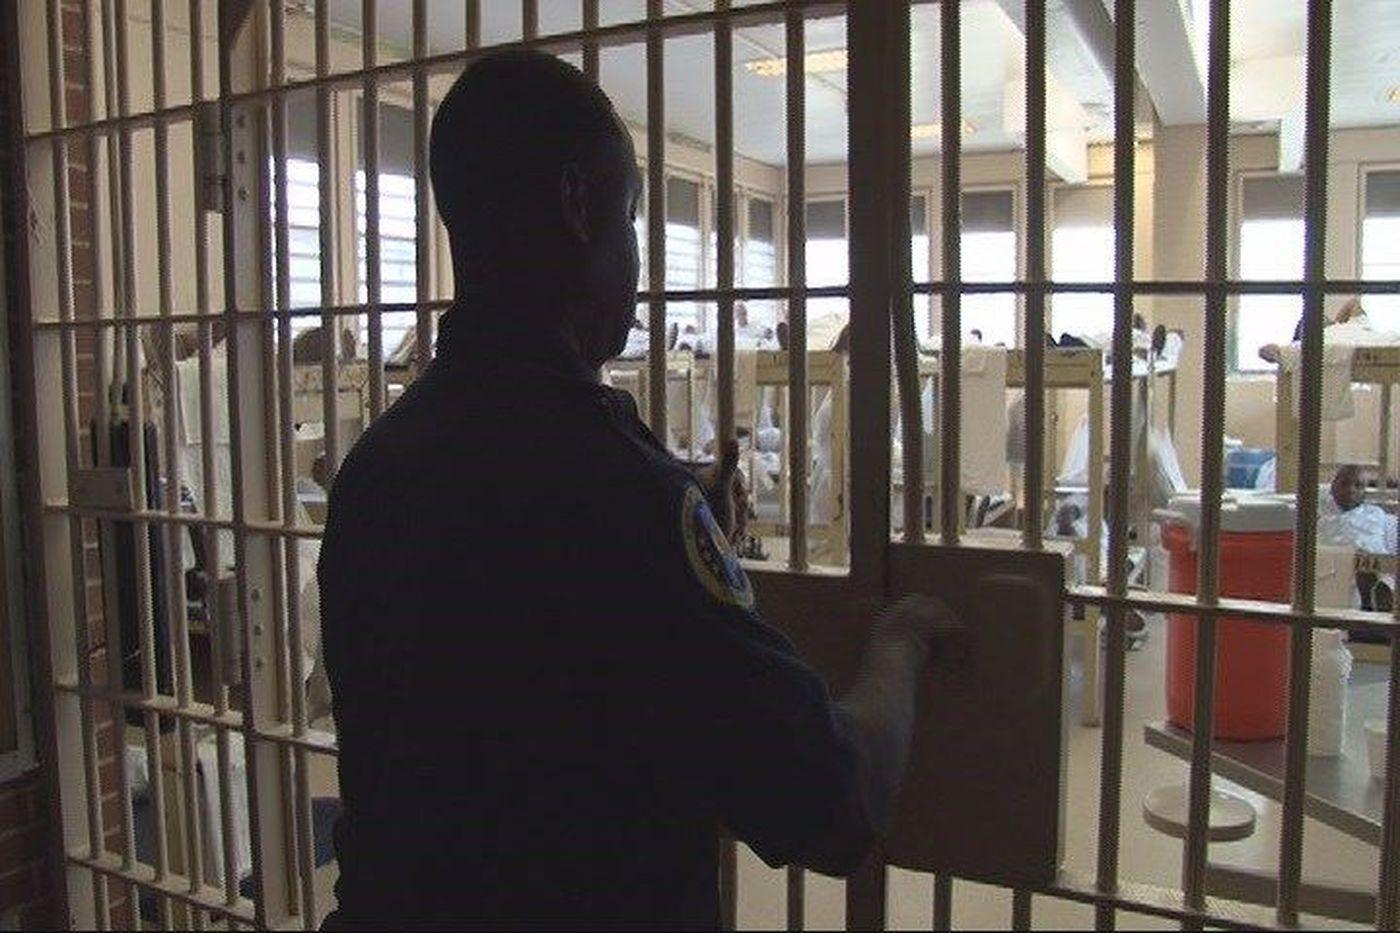 Inside Kilby Correctional Facility: overcrowded & understaffed